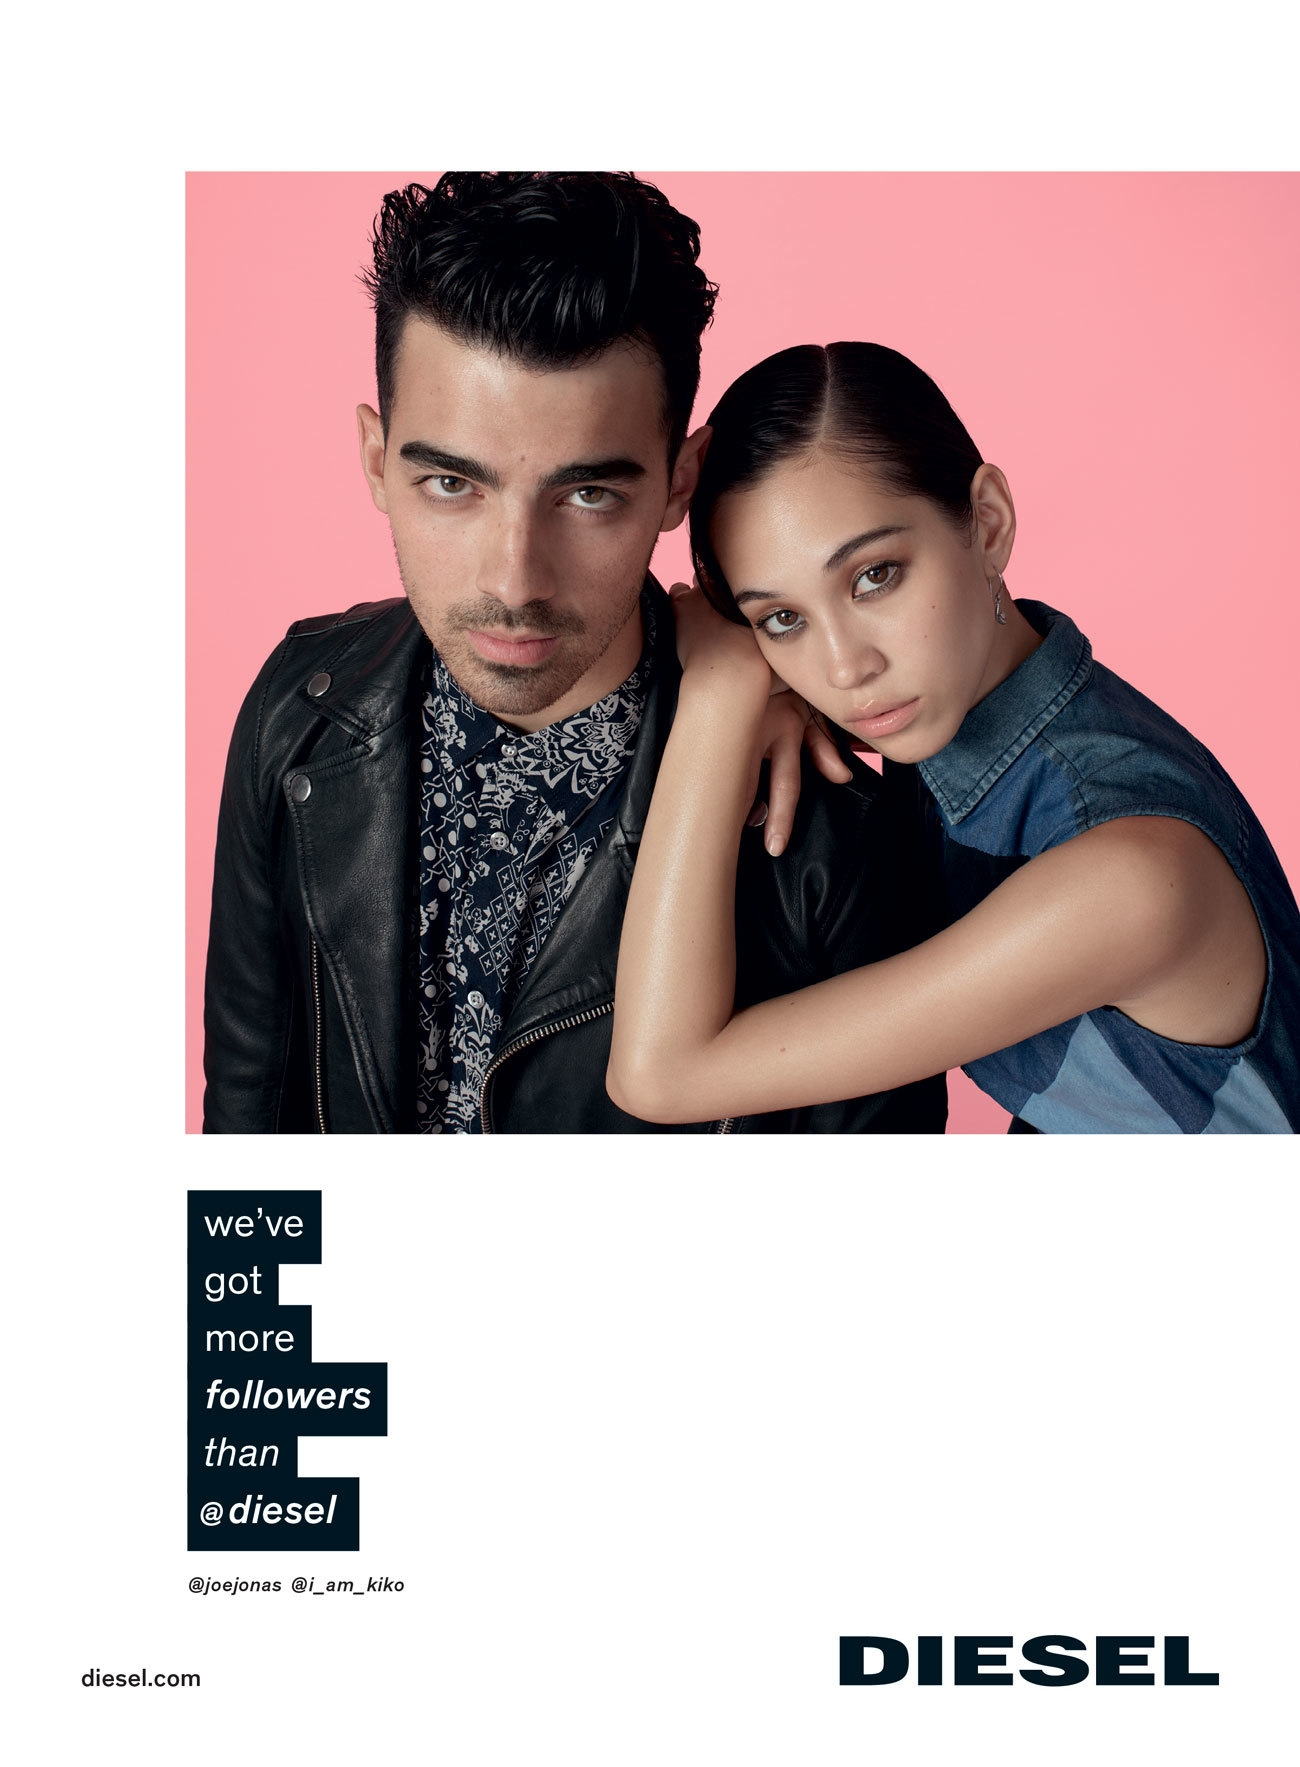 Joe Jonas Leads Cast for Diesel's Spring Ads